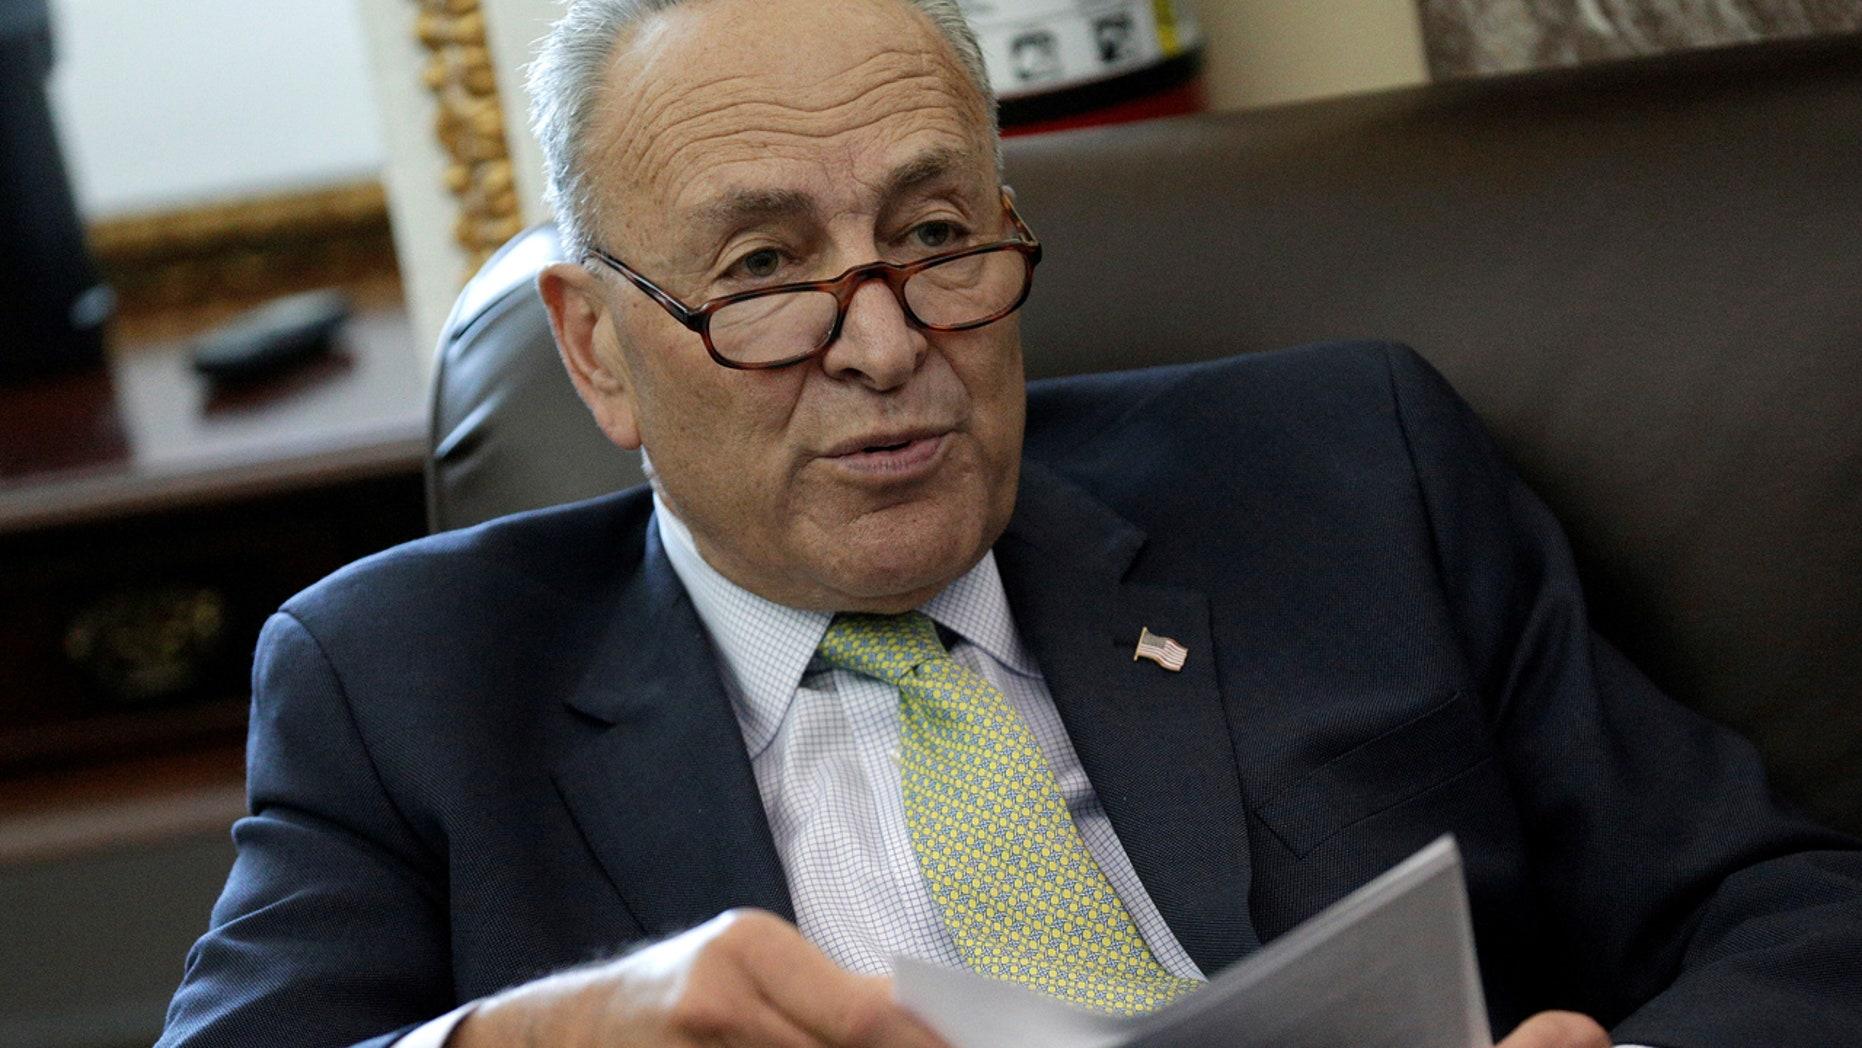 Oct. 18: Senate Minority Chuck Schumer speaks to reporters on Capitol Hill in Washington.